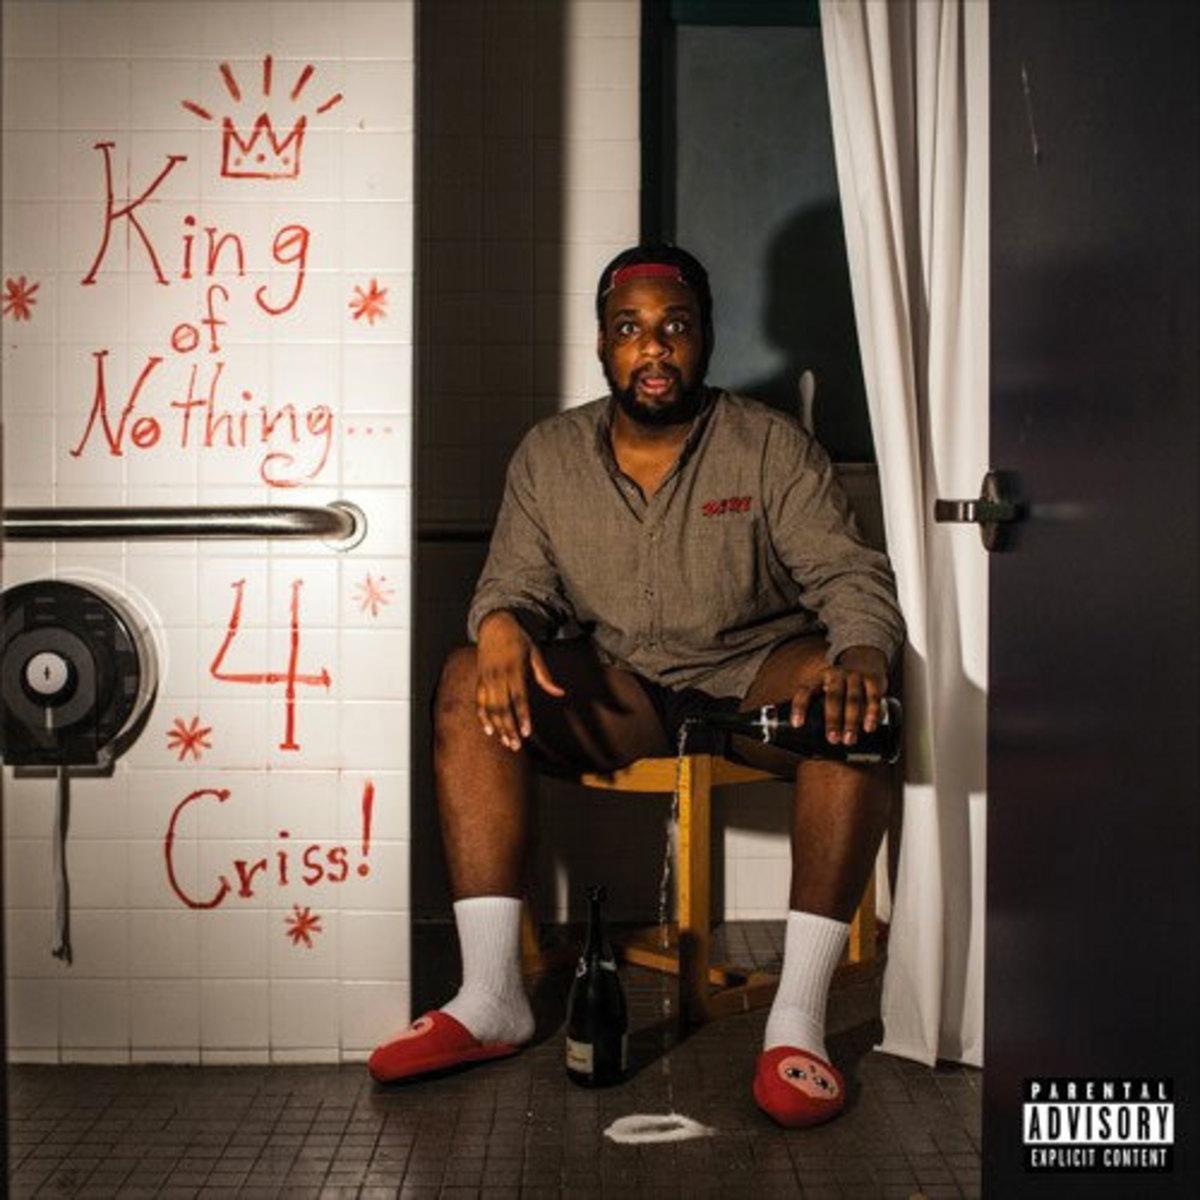 king-of-nothing-4-criss.jpg